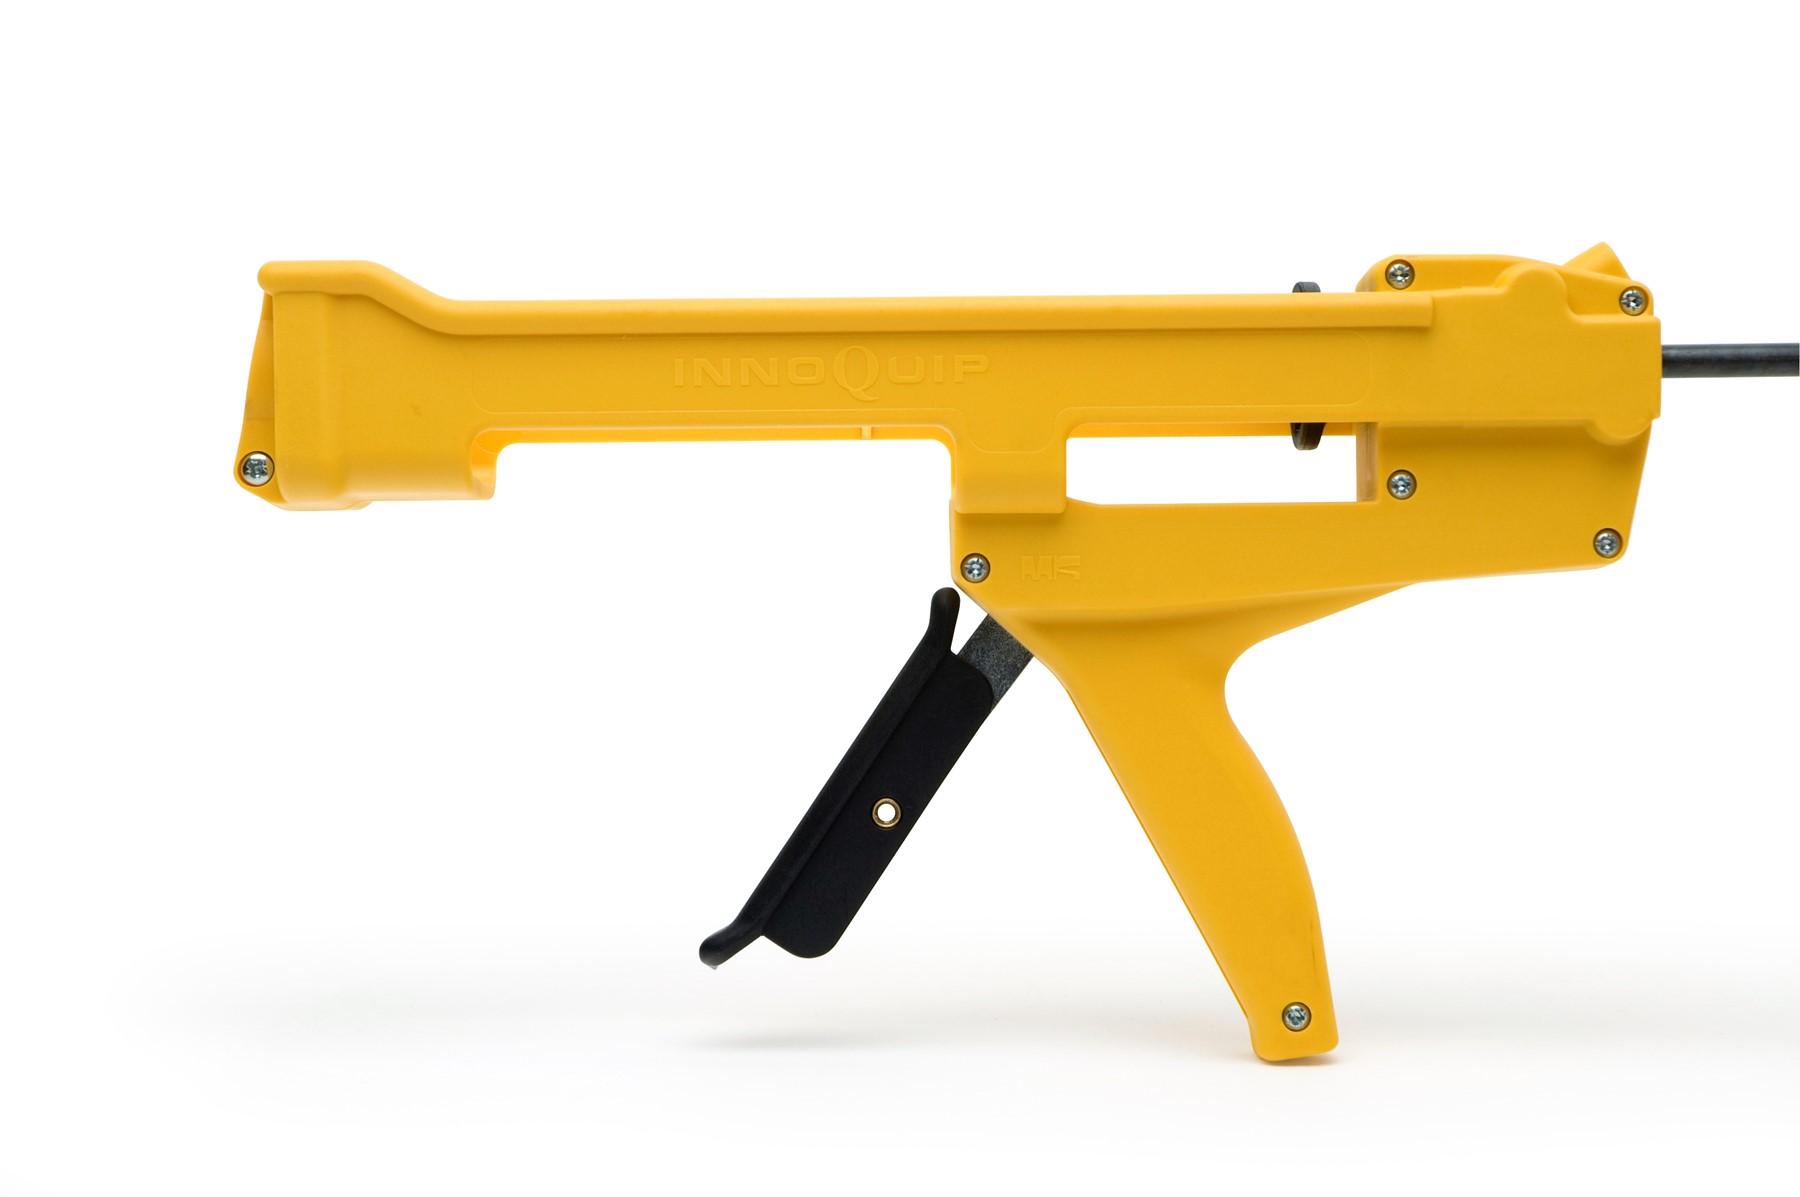 1609_Easy-Grip-Gun_print.jpg